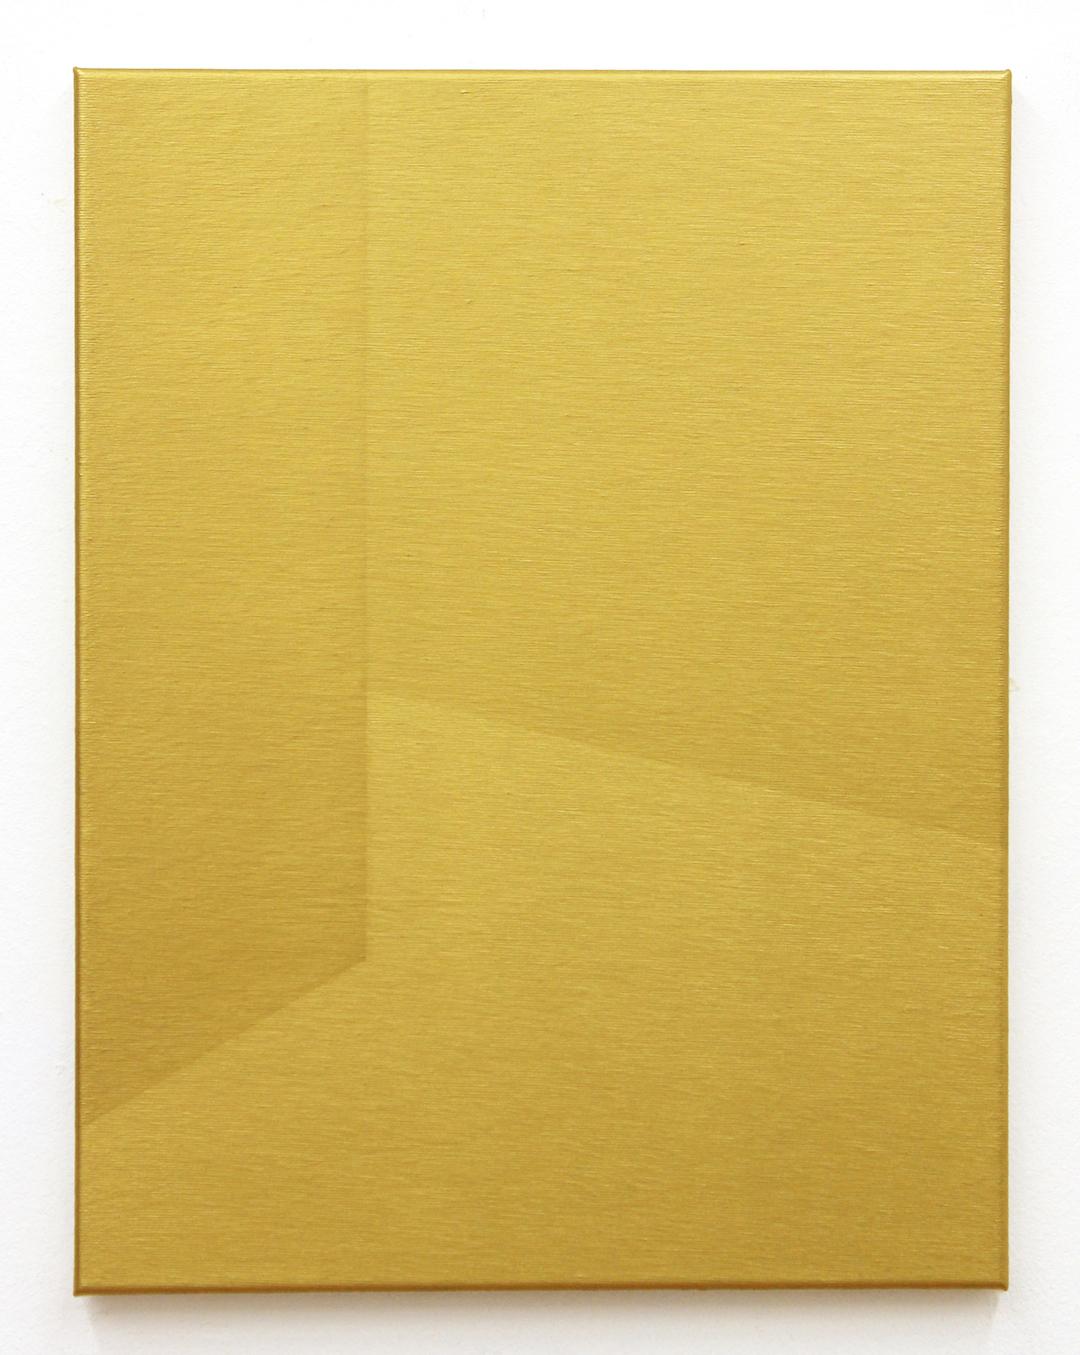 Futo Akiyoshi Room, 2014 Oil on canvas